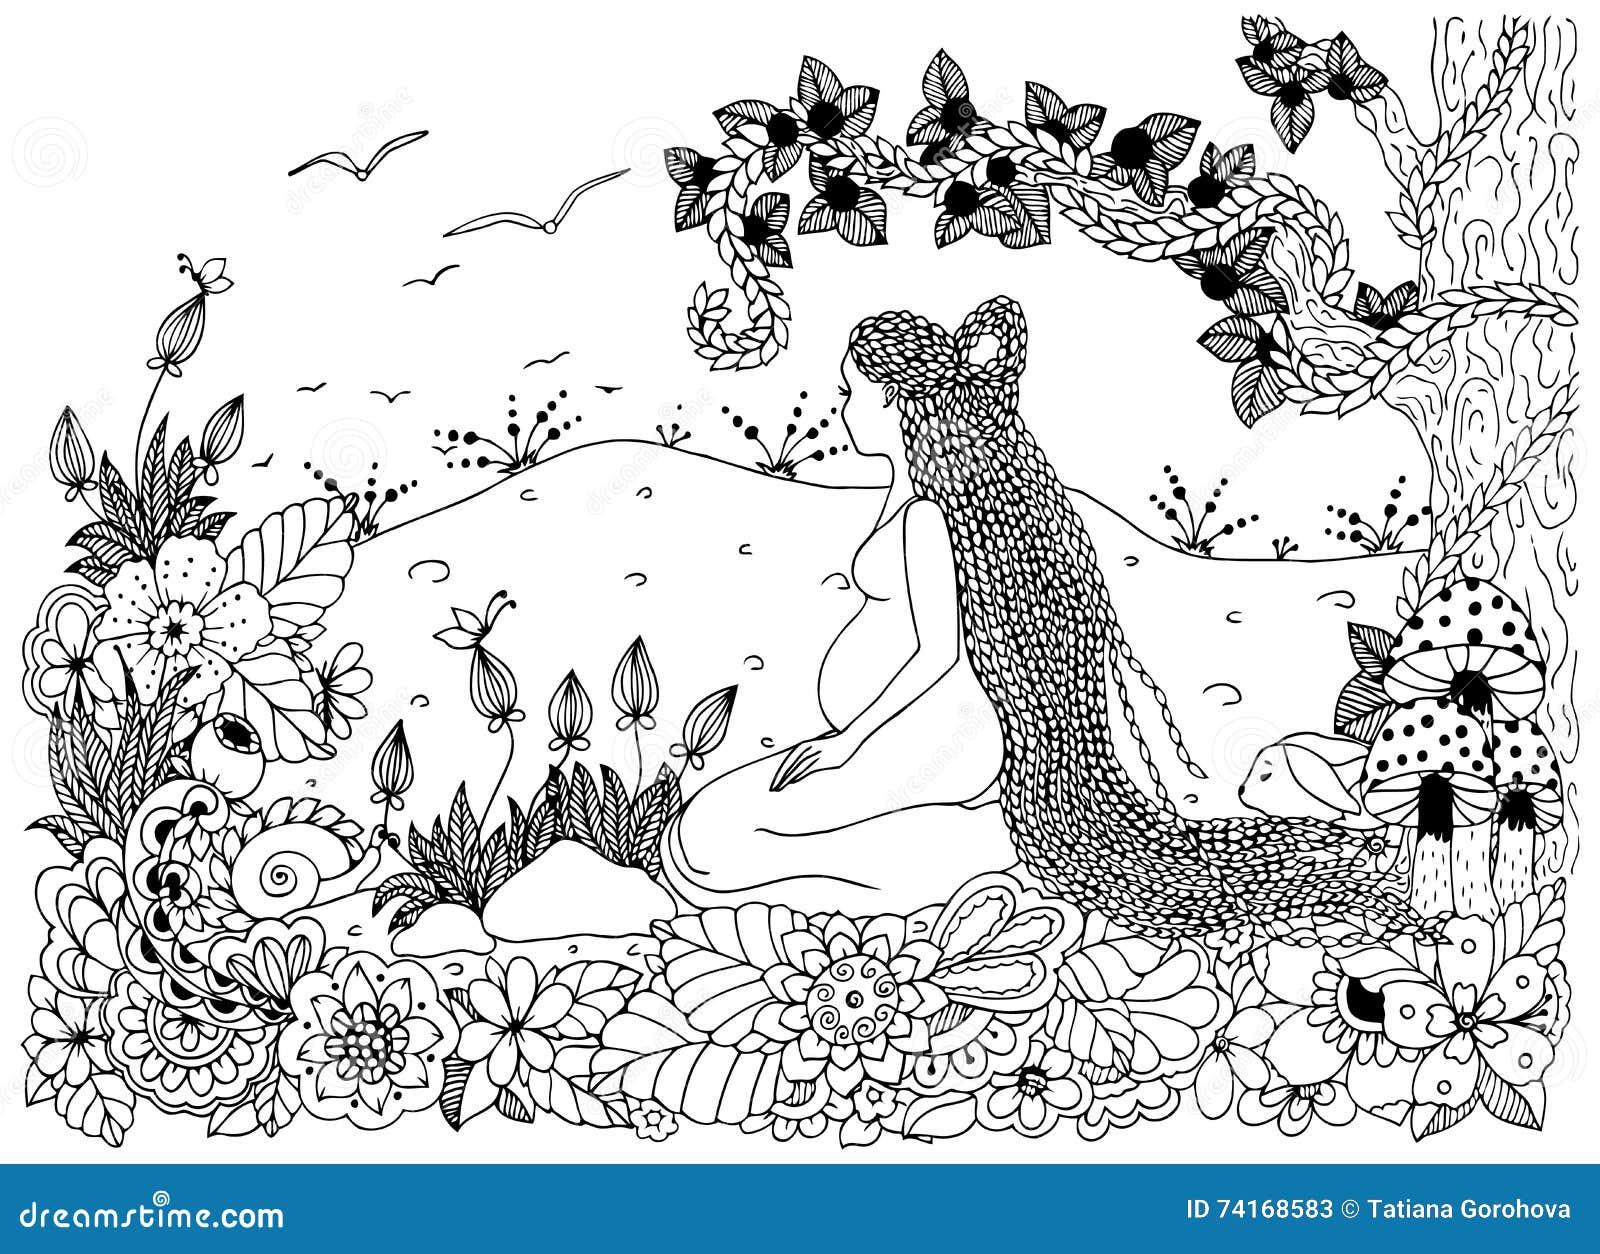 Dirigez L Illustration Zen Tangle Une Femme Enceinte S Asseyant En